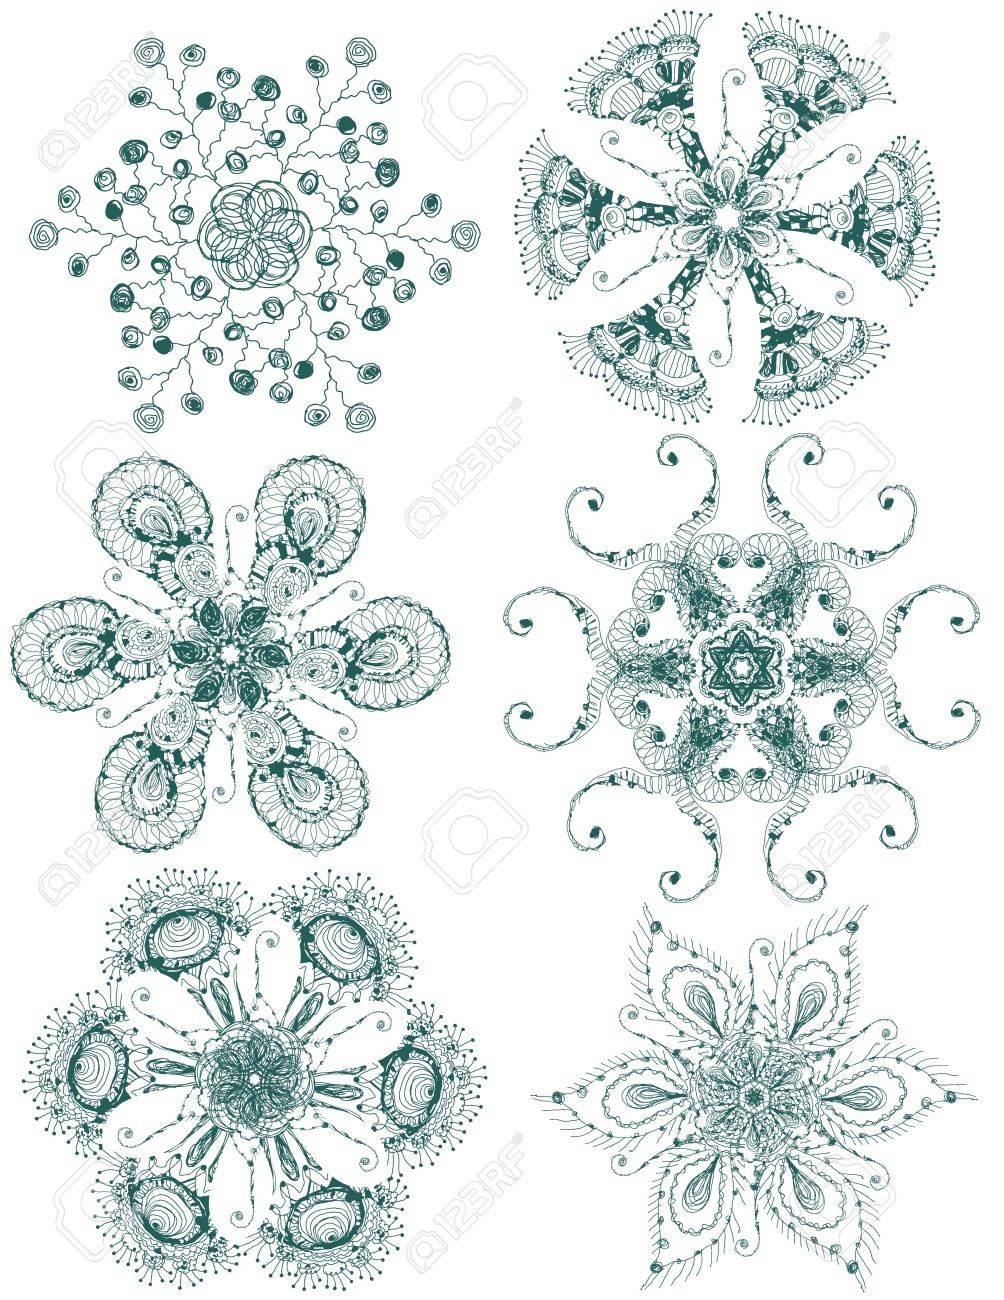 Vector hand drawn vintage set of snowflakes - 11655697